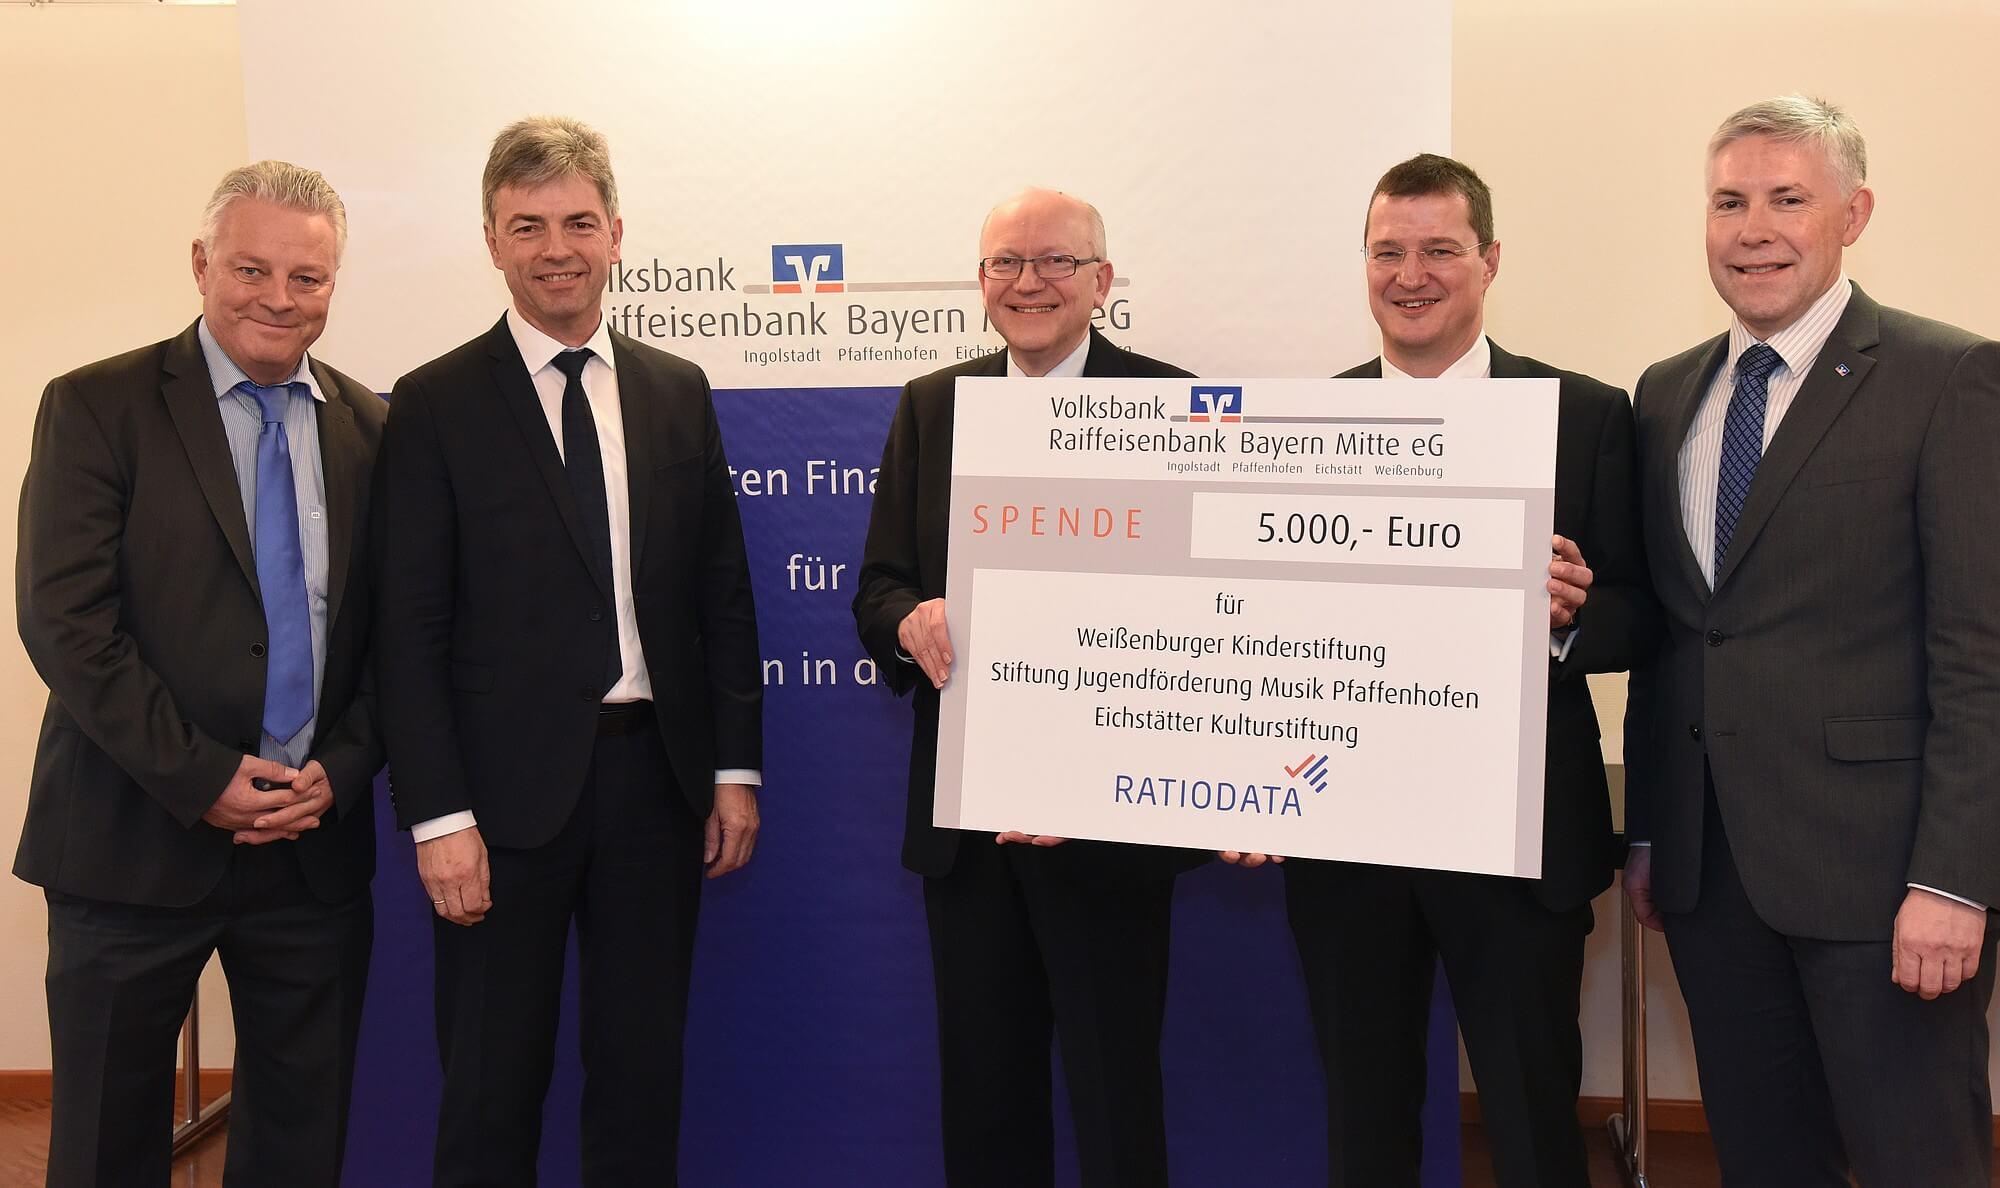 Ratiodata-Spende Volksbank Raiffeisenbank Bayern-Mitte